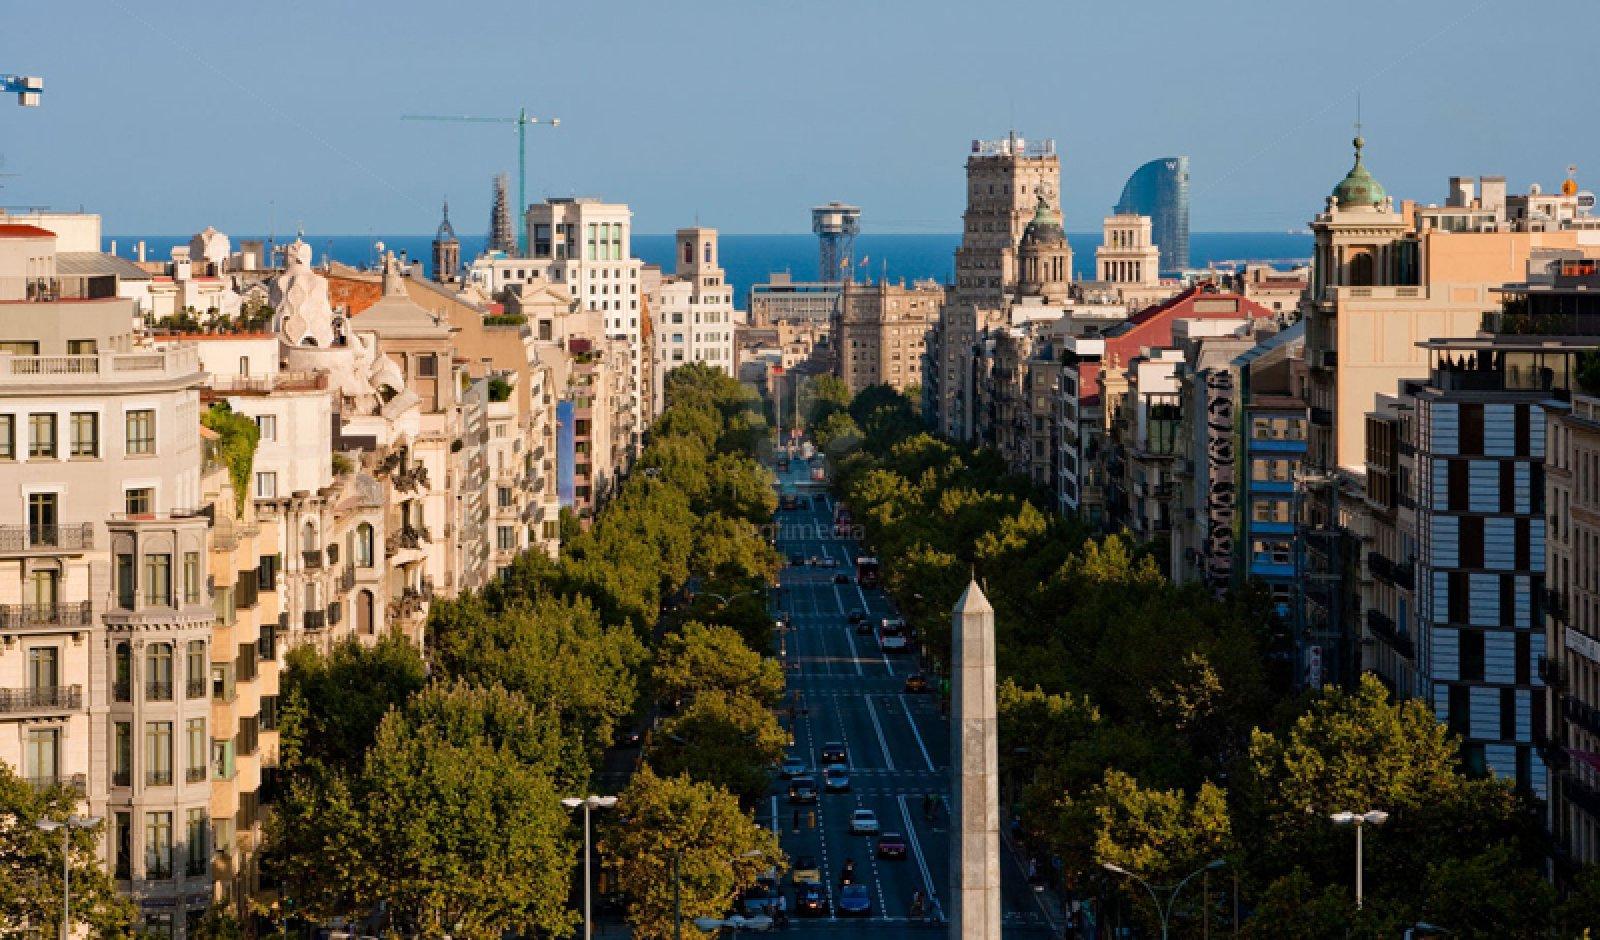 Imatge de passeig de Gràcia de Barcelona